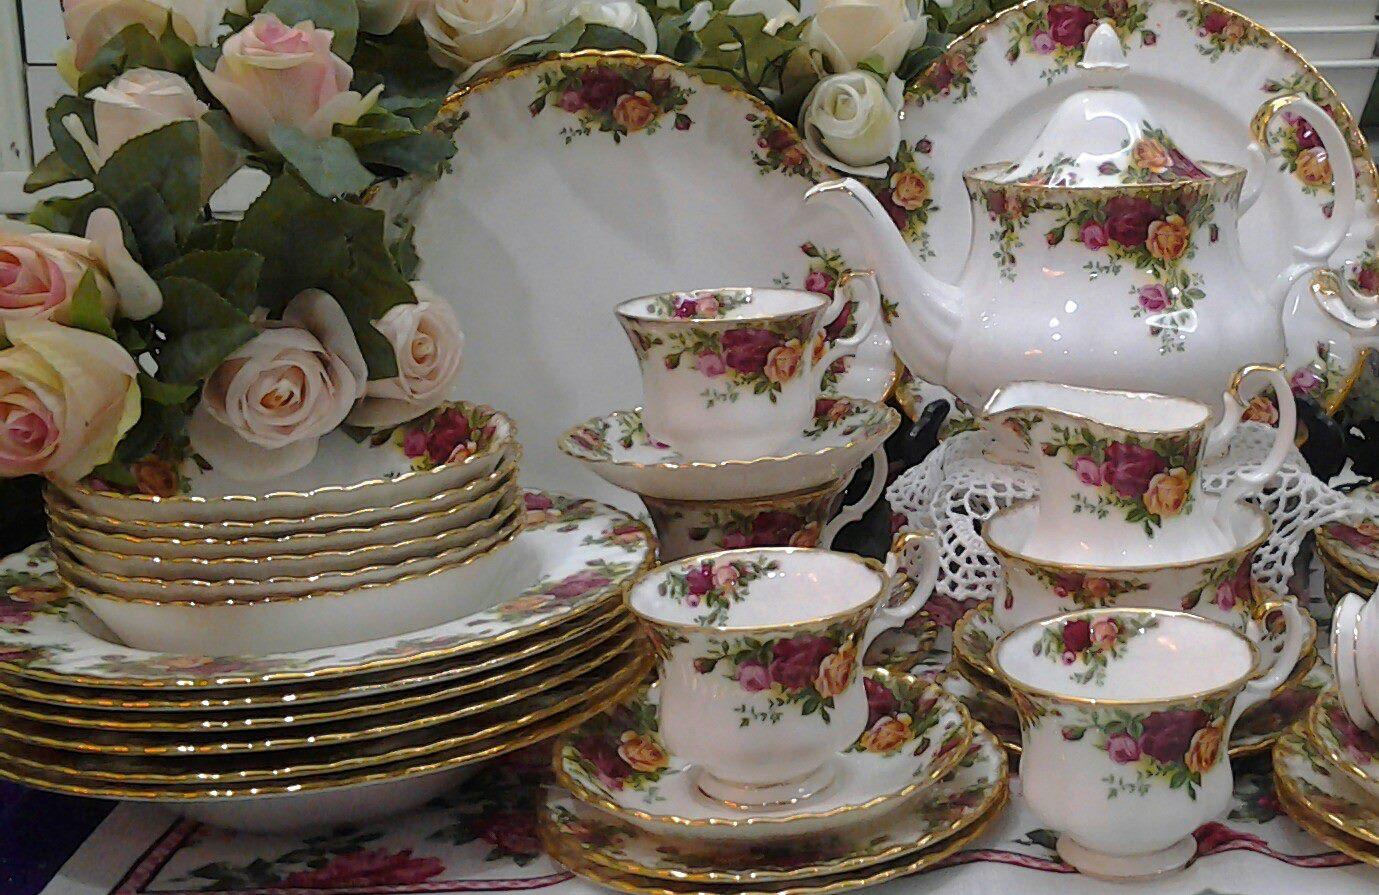 Lovely Treasures From English Garden Royal Albert Old